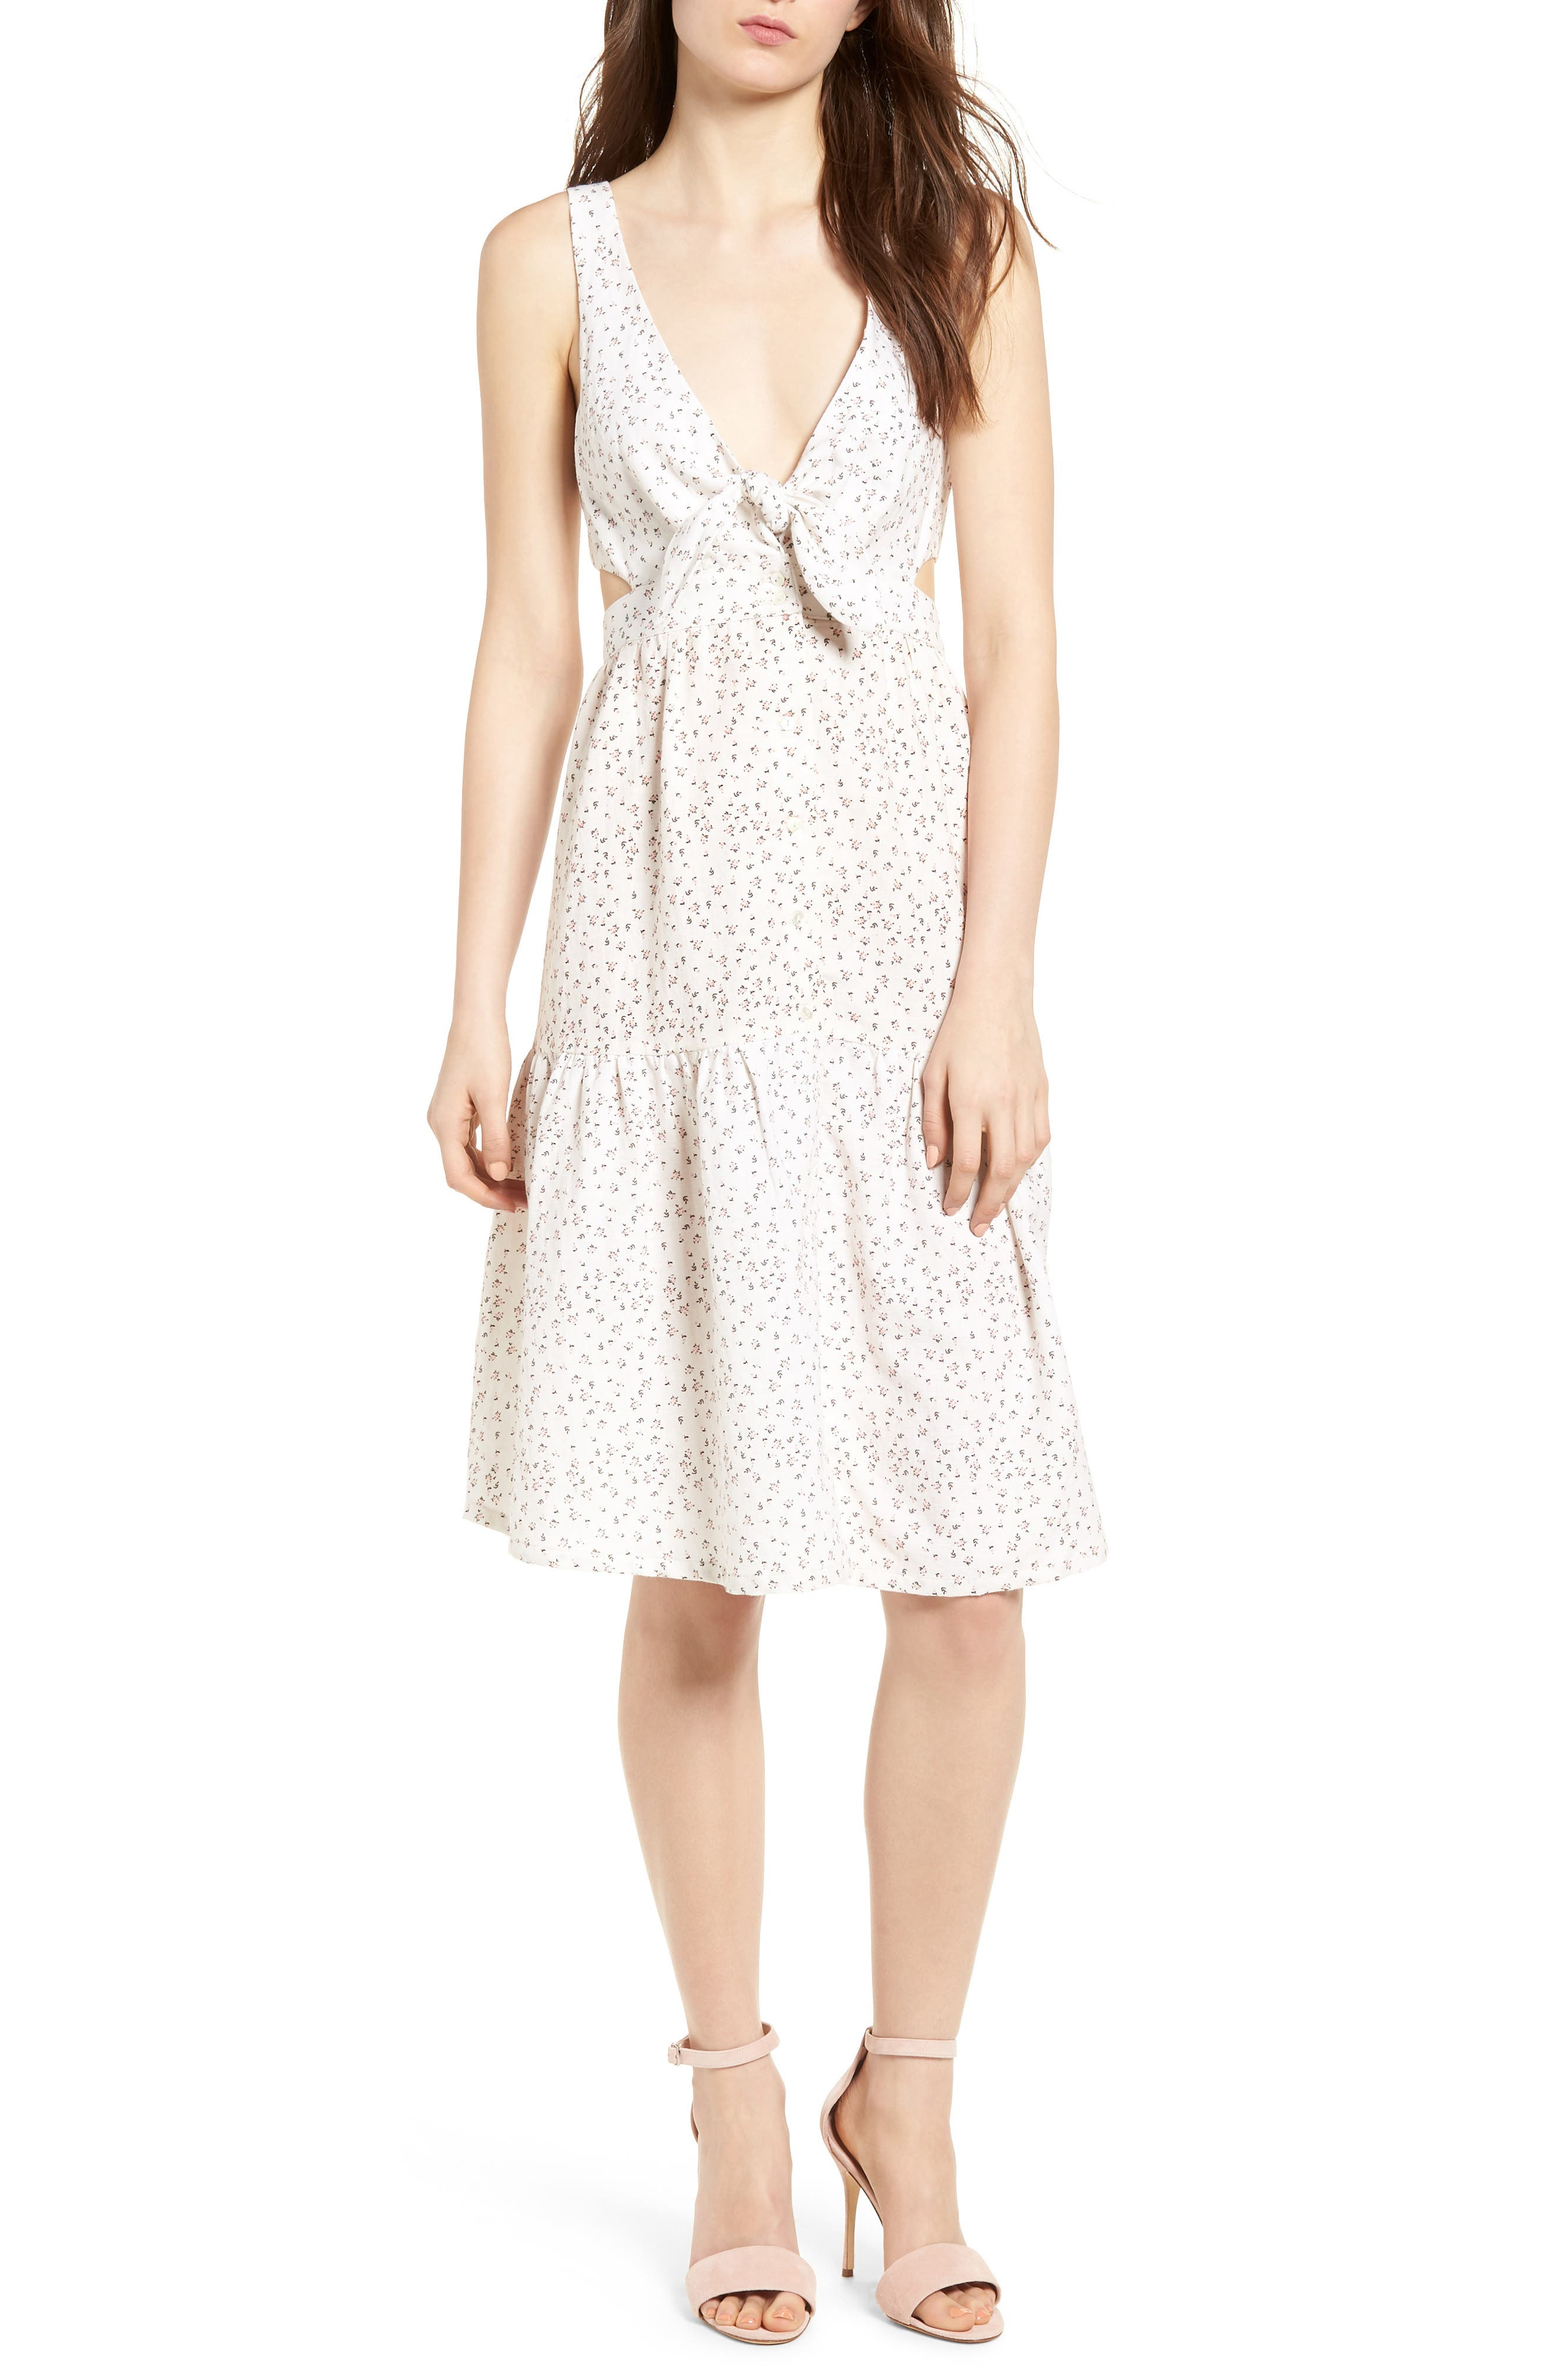 Alternate Image 1 Selected - McGuire Palizzi Cutout Tie Front Dress